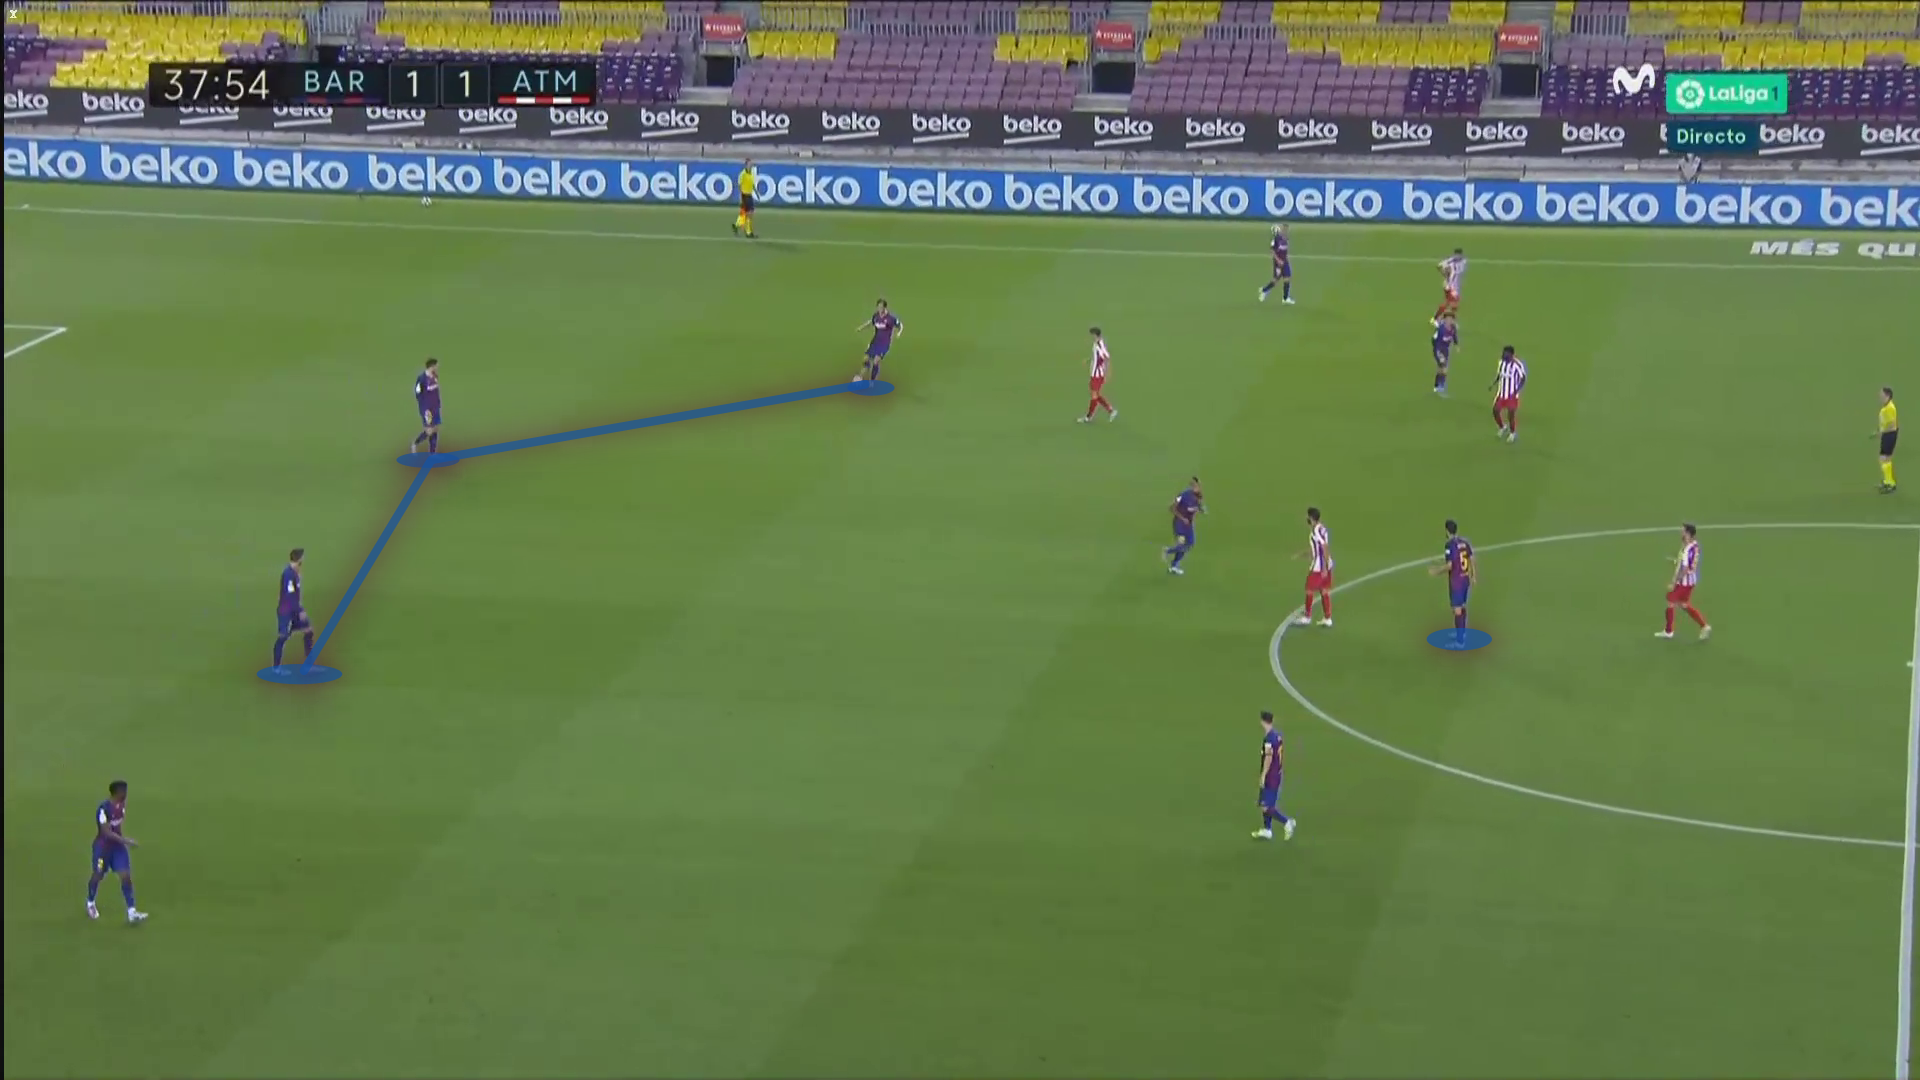 La Liga 2019/20: Barcelona vs Atletico Madrid - tactical analysis tactics